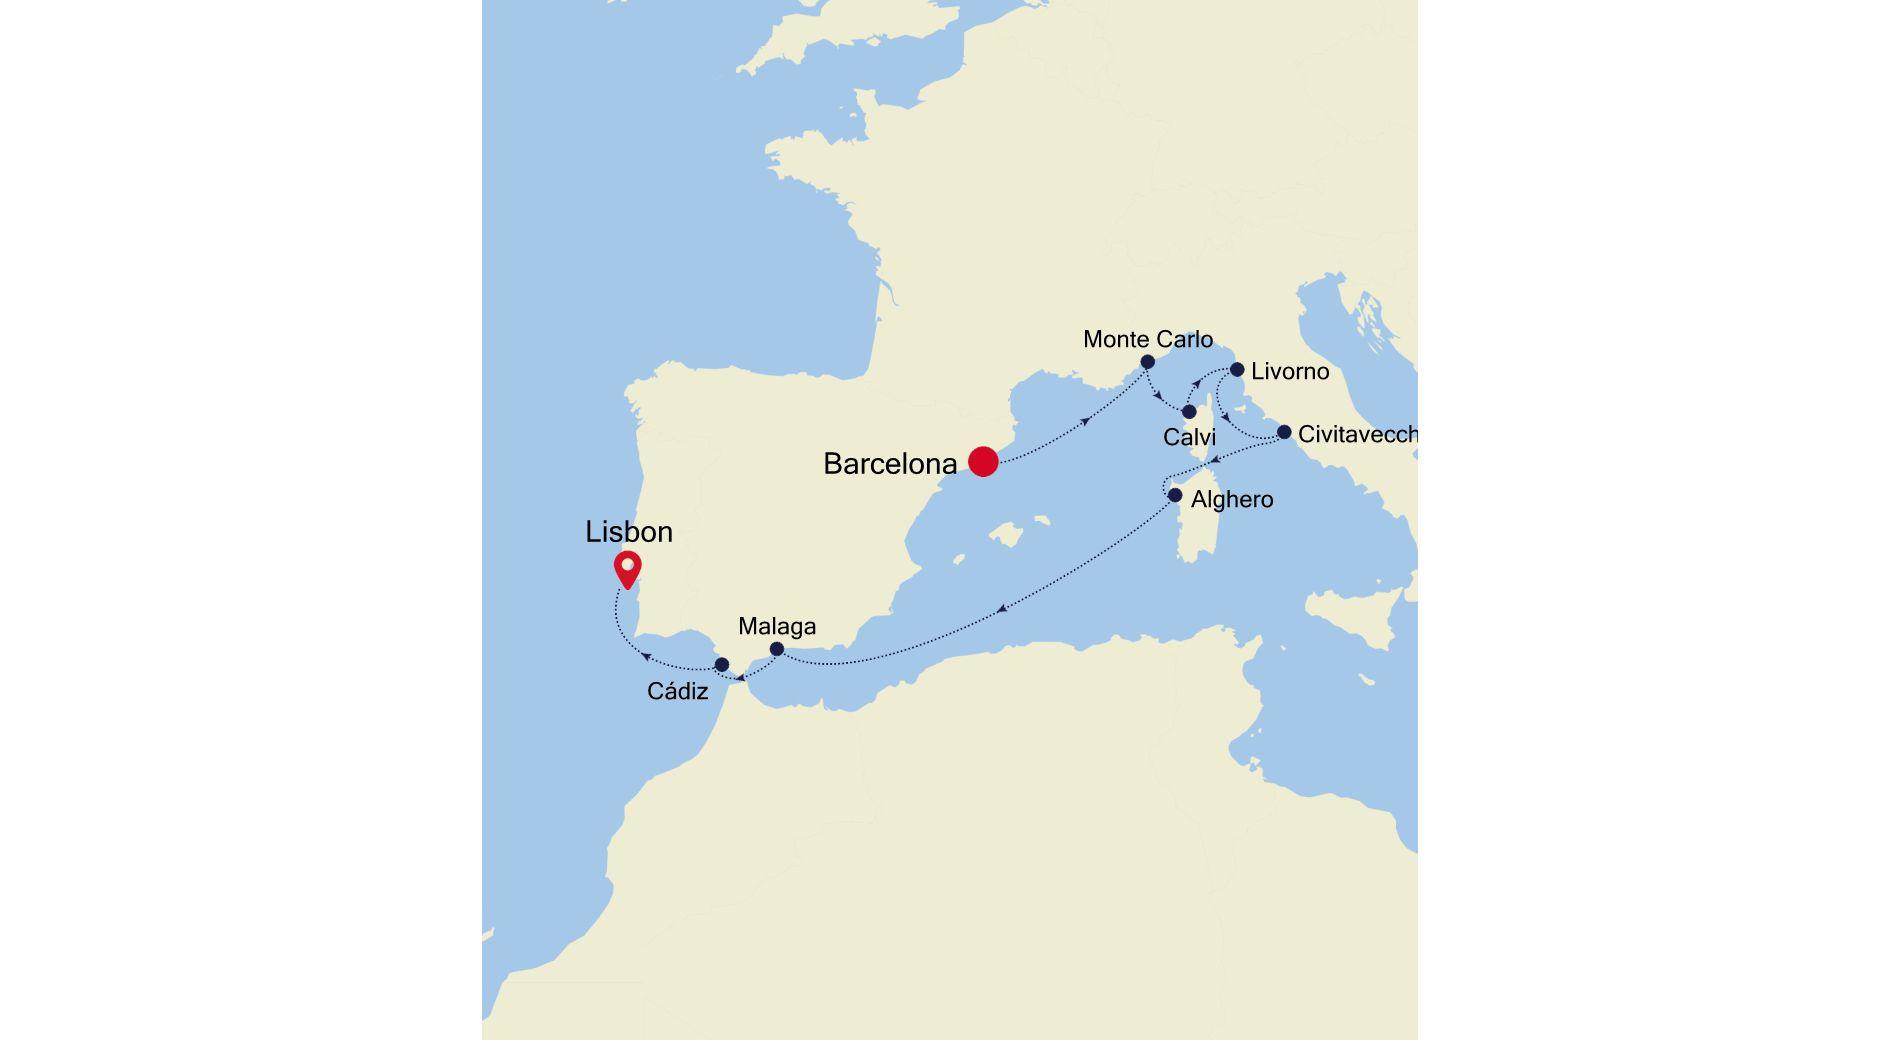 MO200824010 - Barcelona to Lisbon